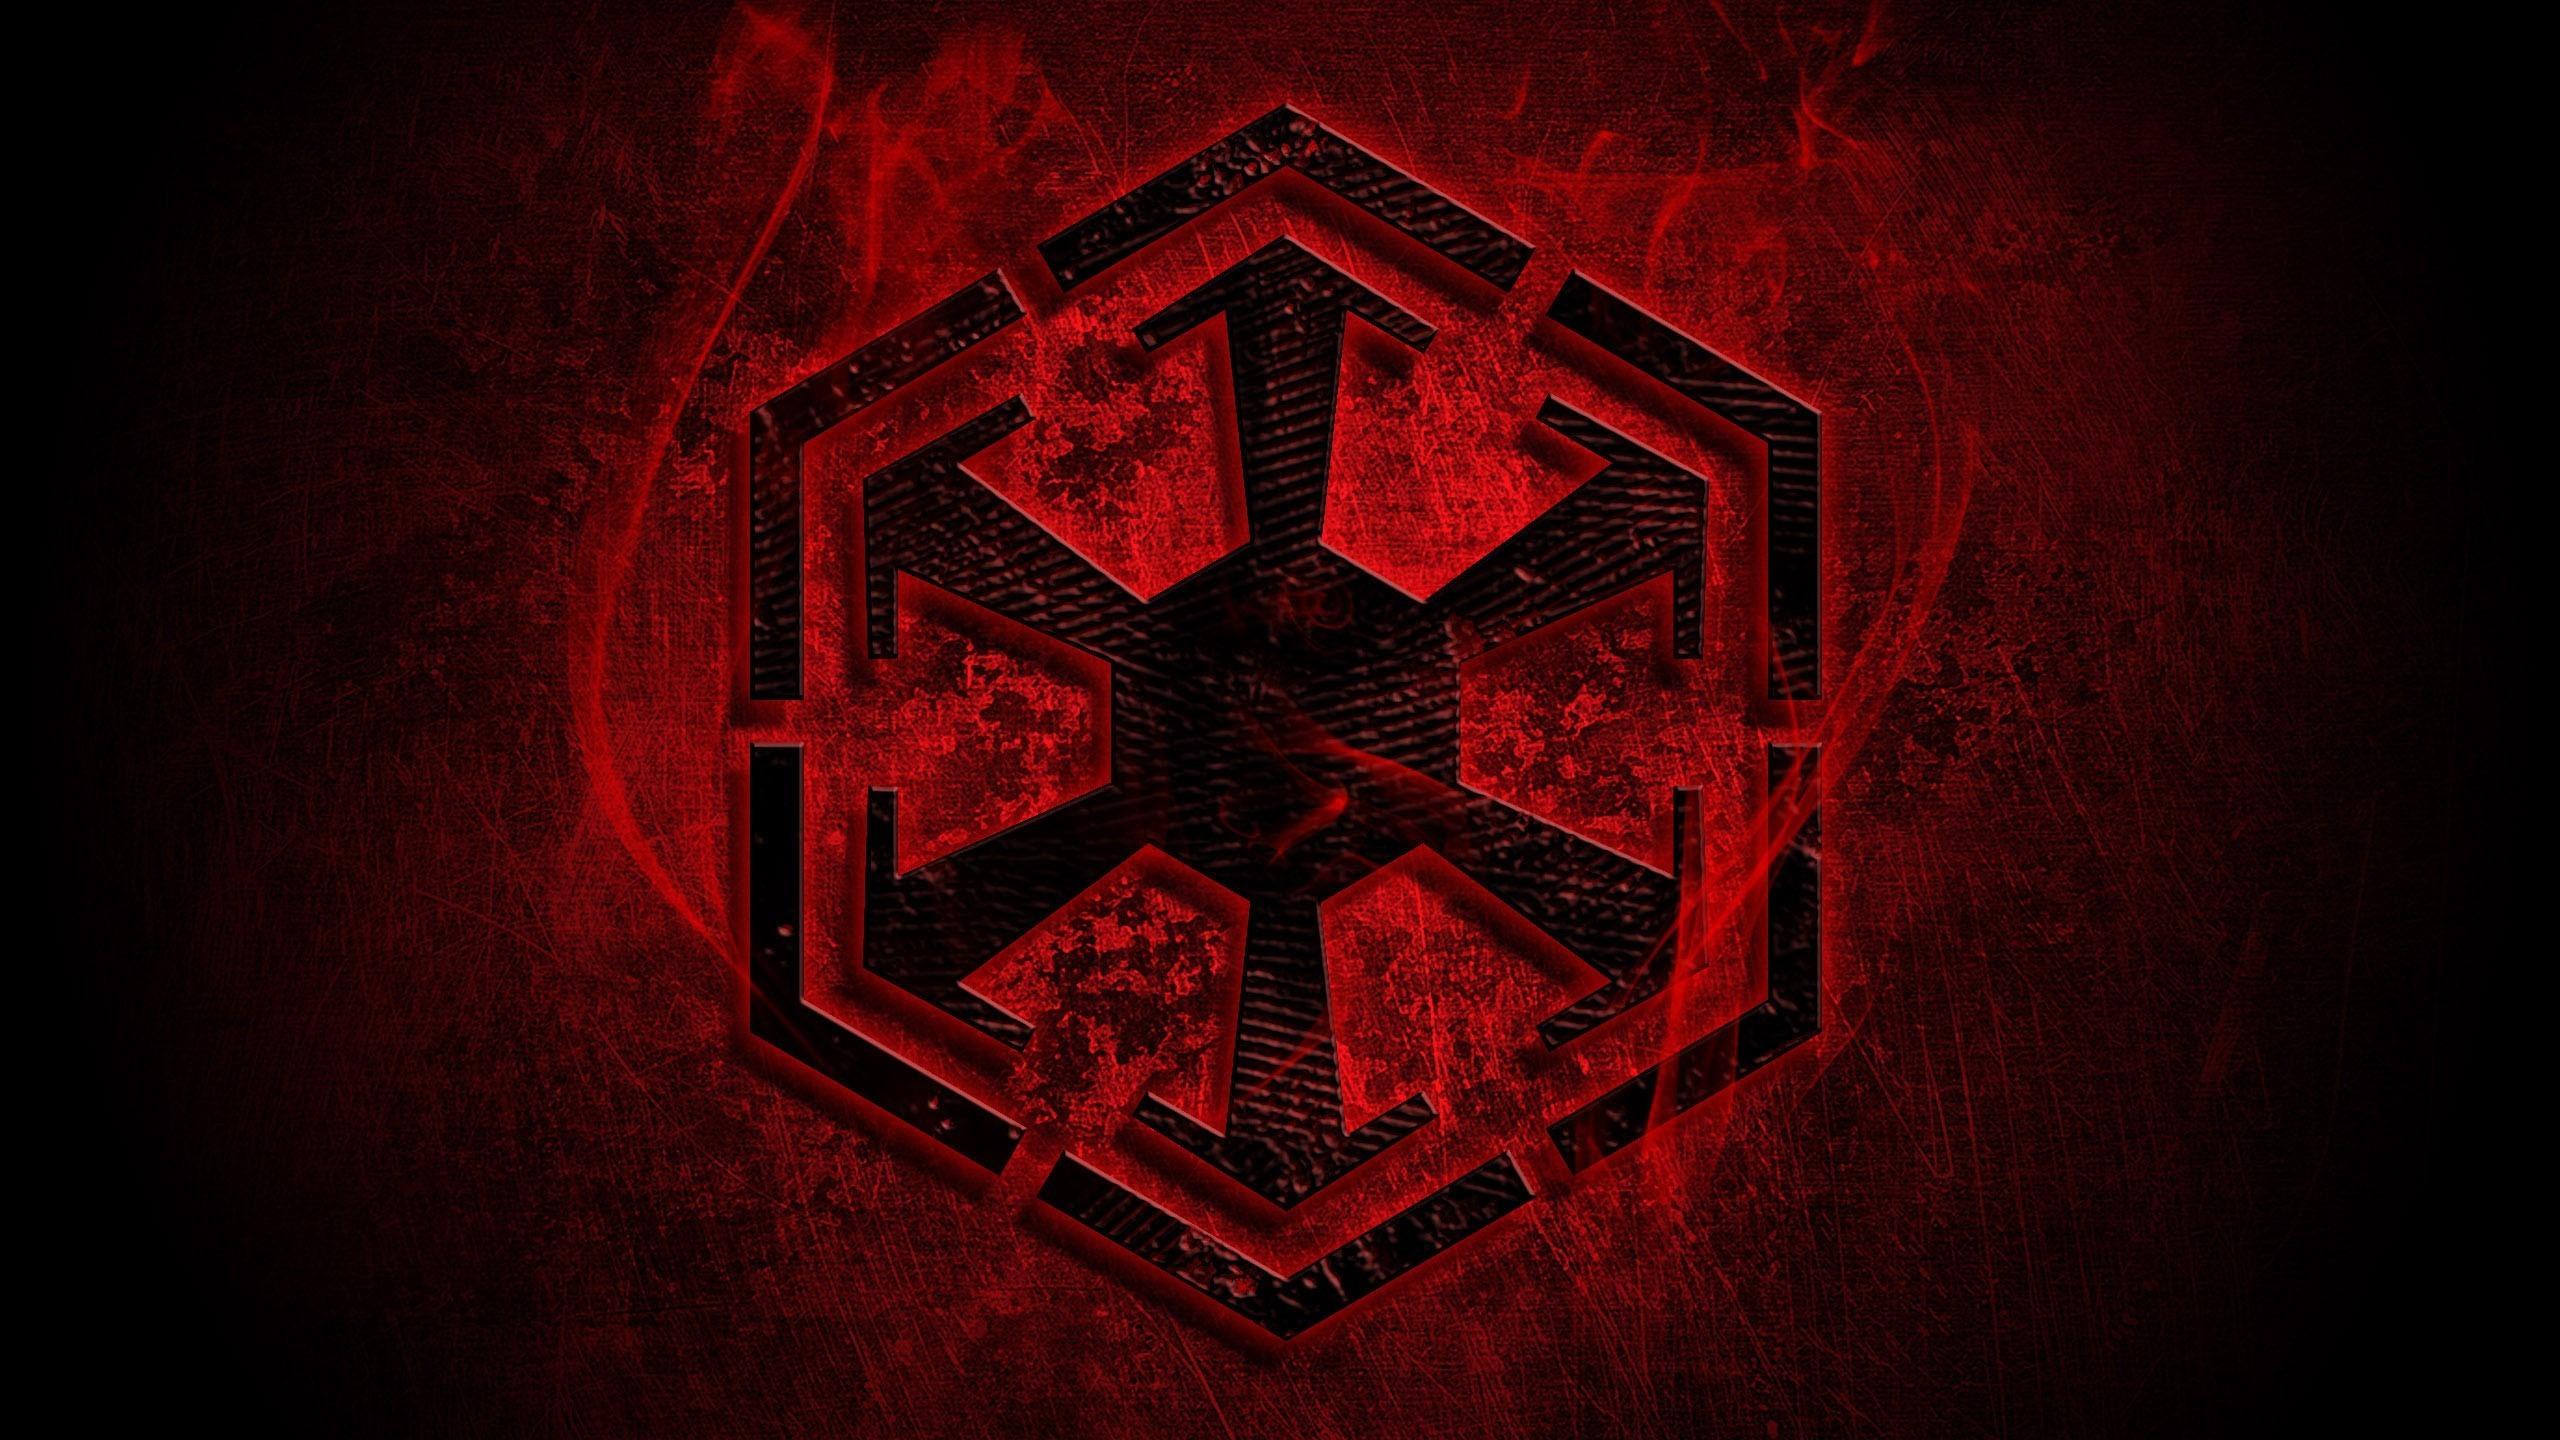 2560x1440 Wallpaper Star Wars A Sith Empire